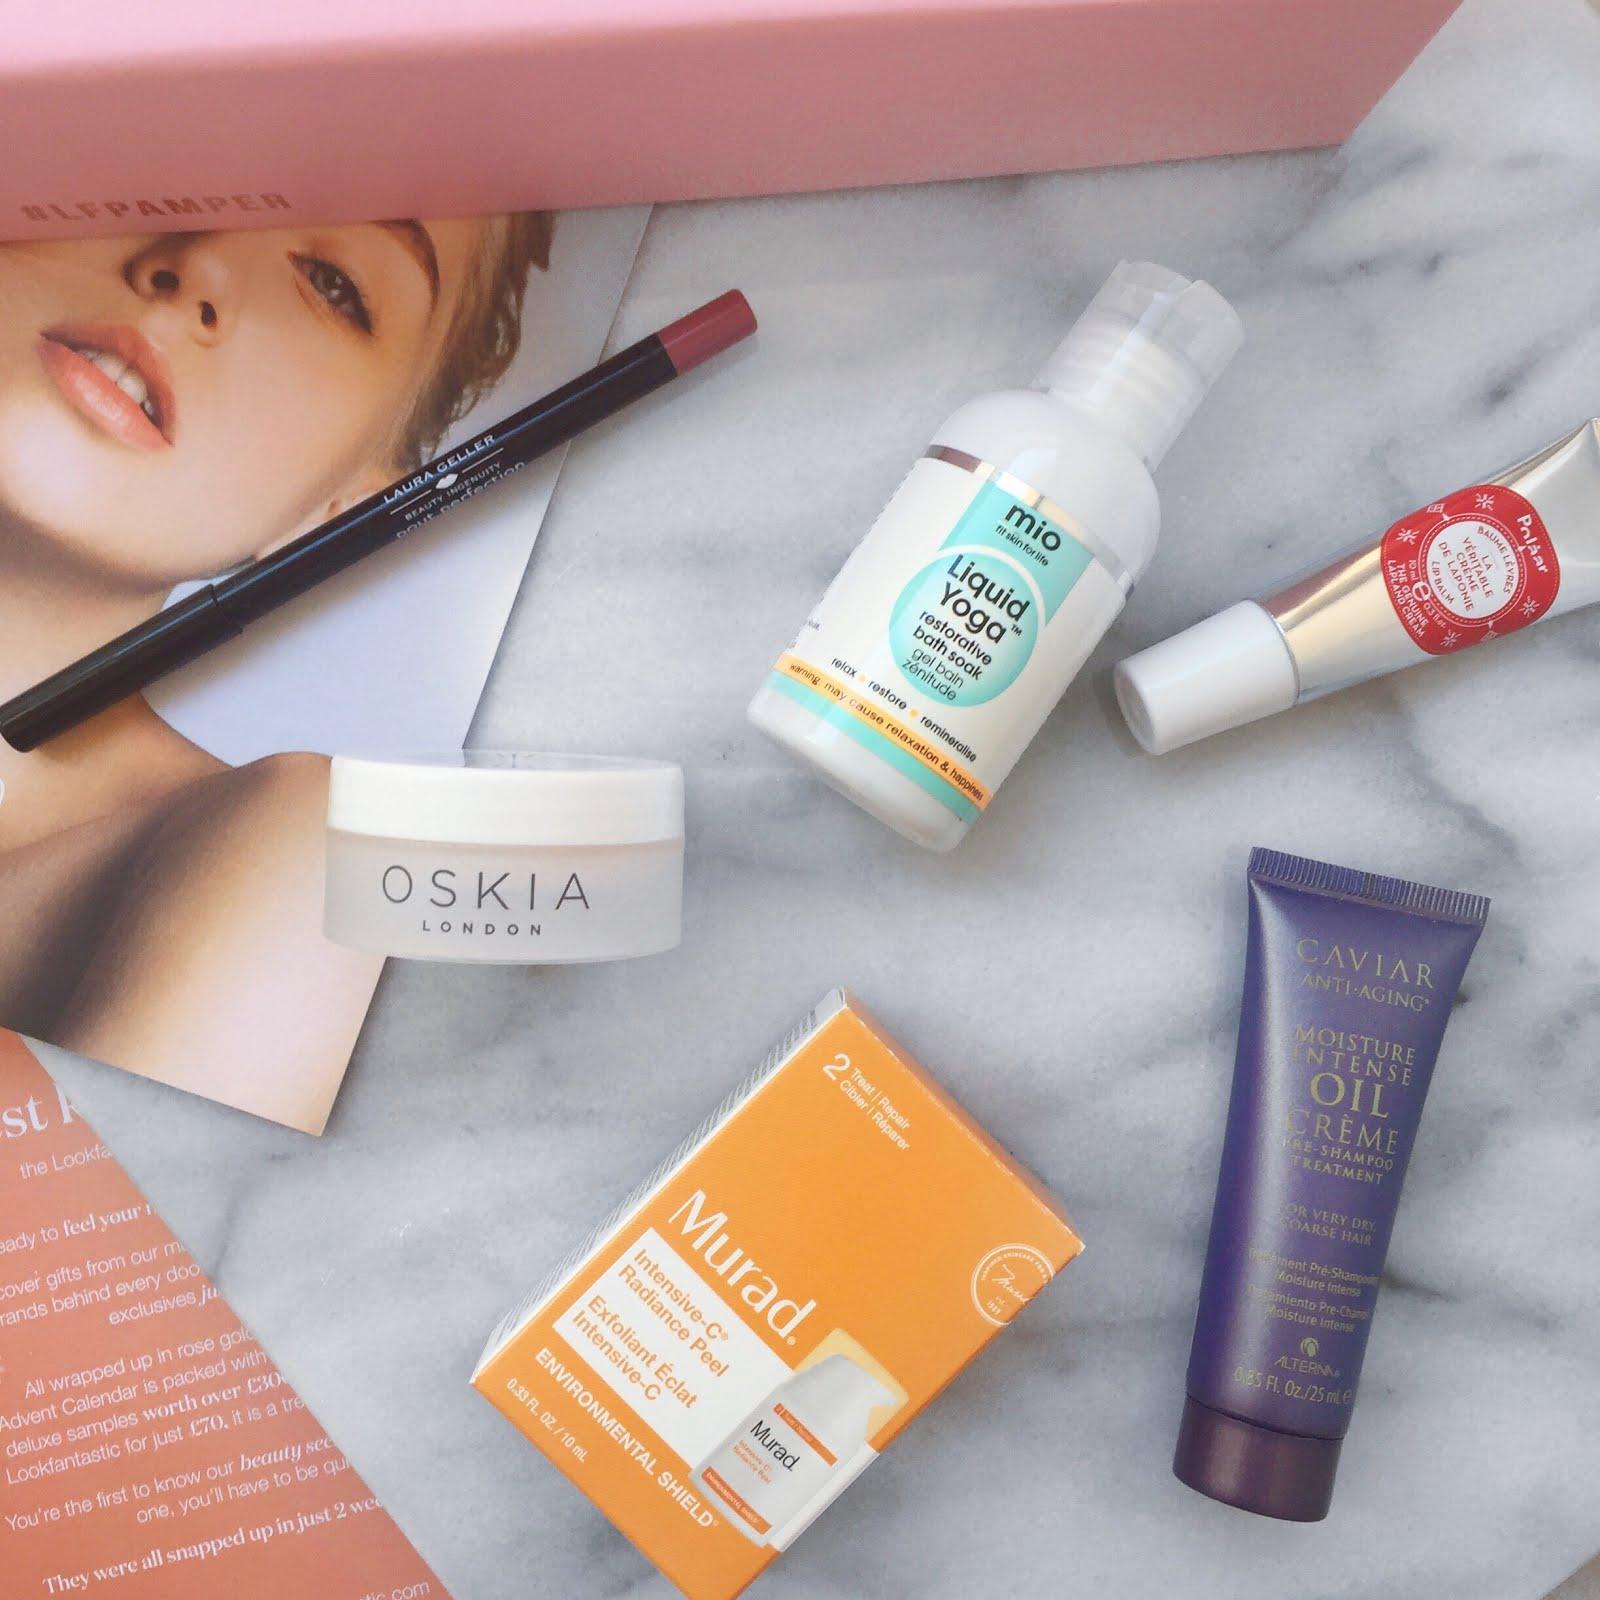 #LFPAMPER, Look fantastic beauty box, laura geller cabernet, oskia renaissance mask